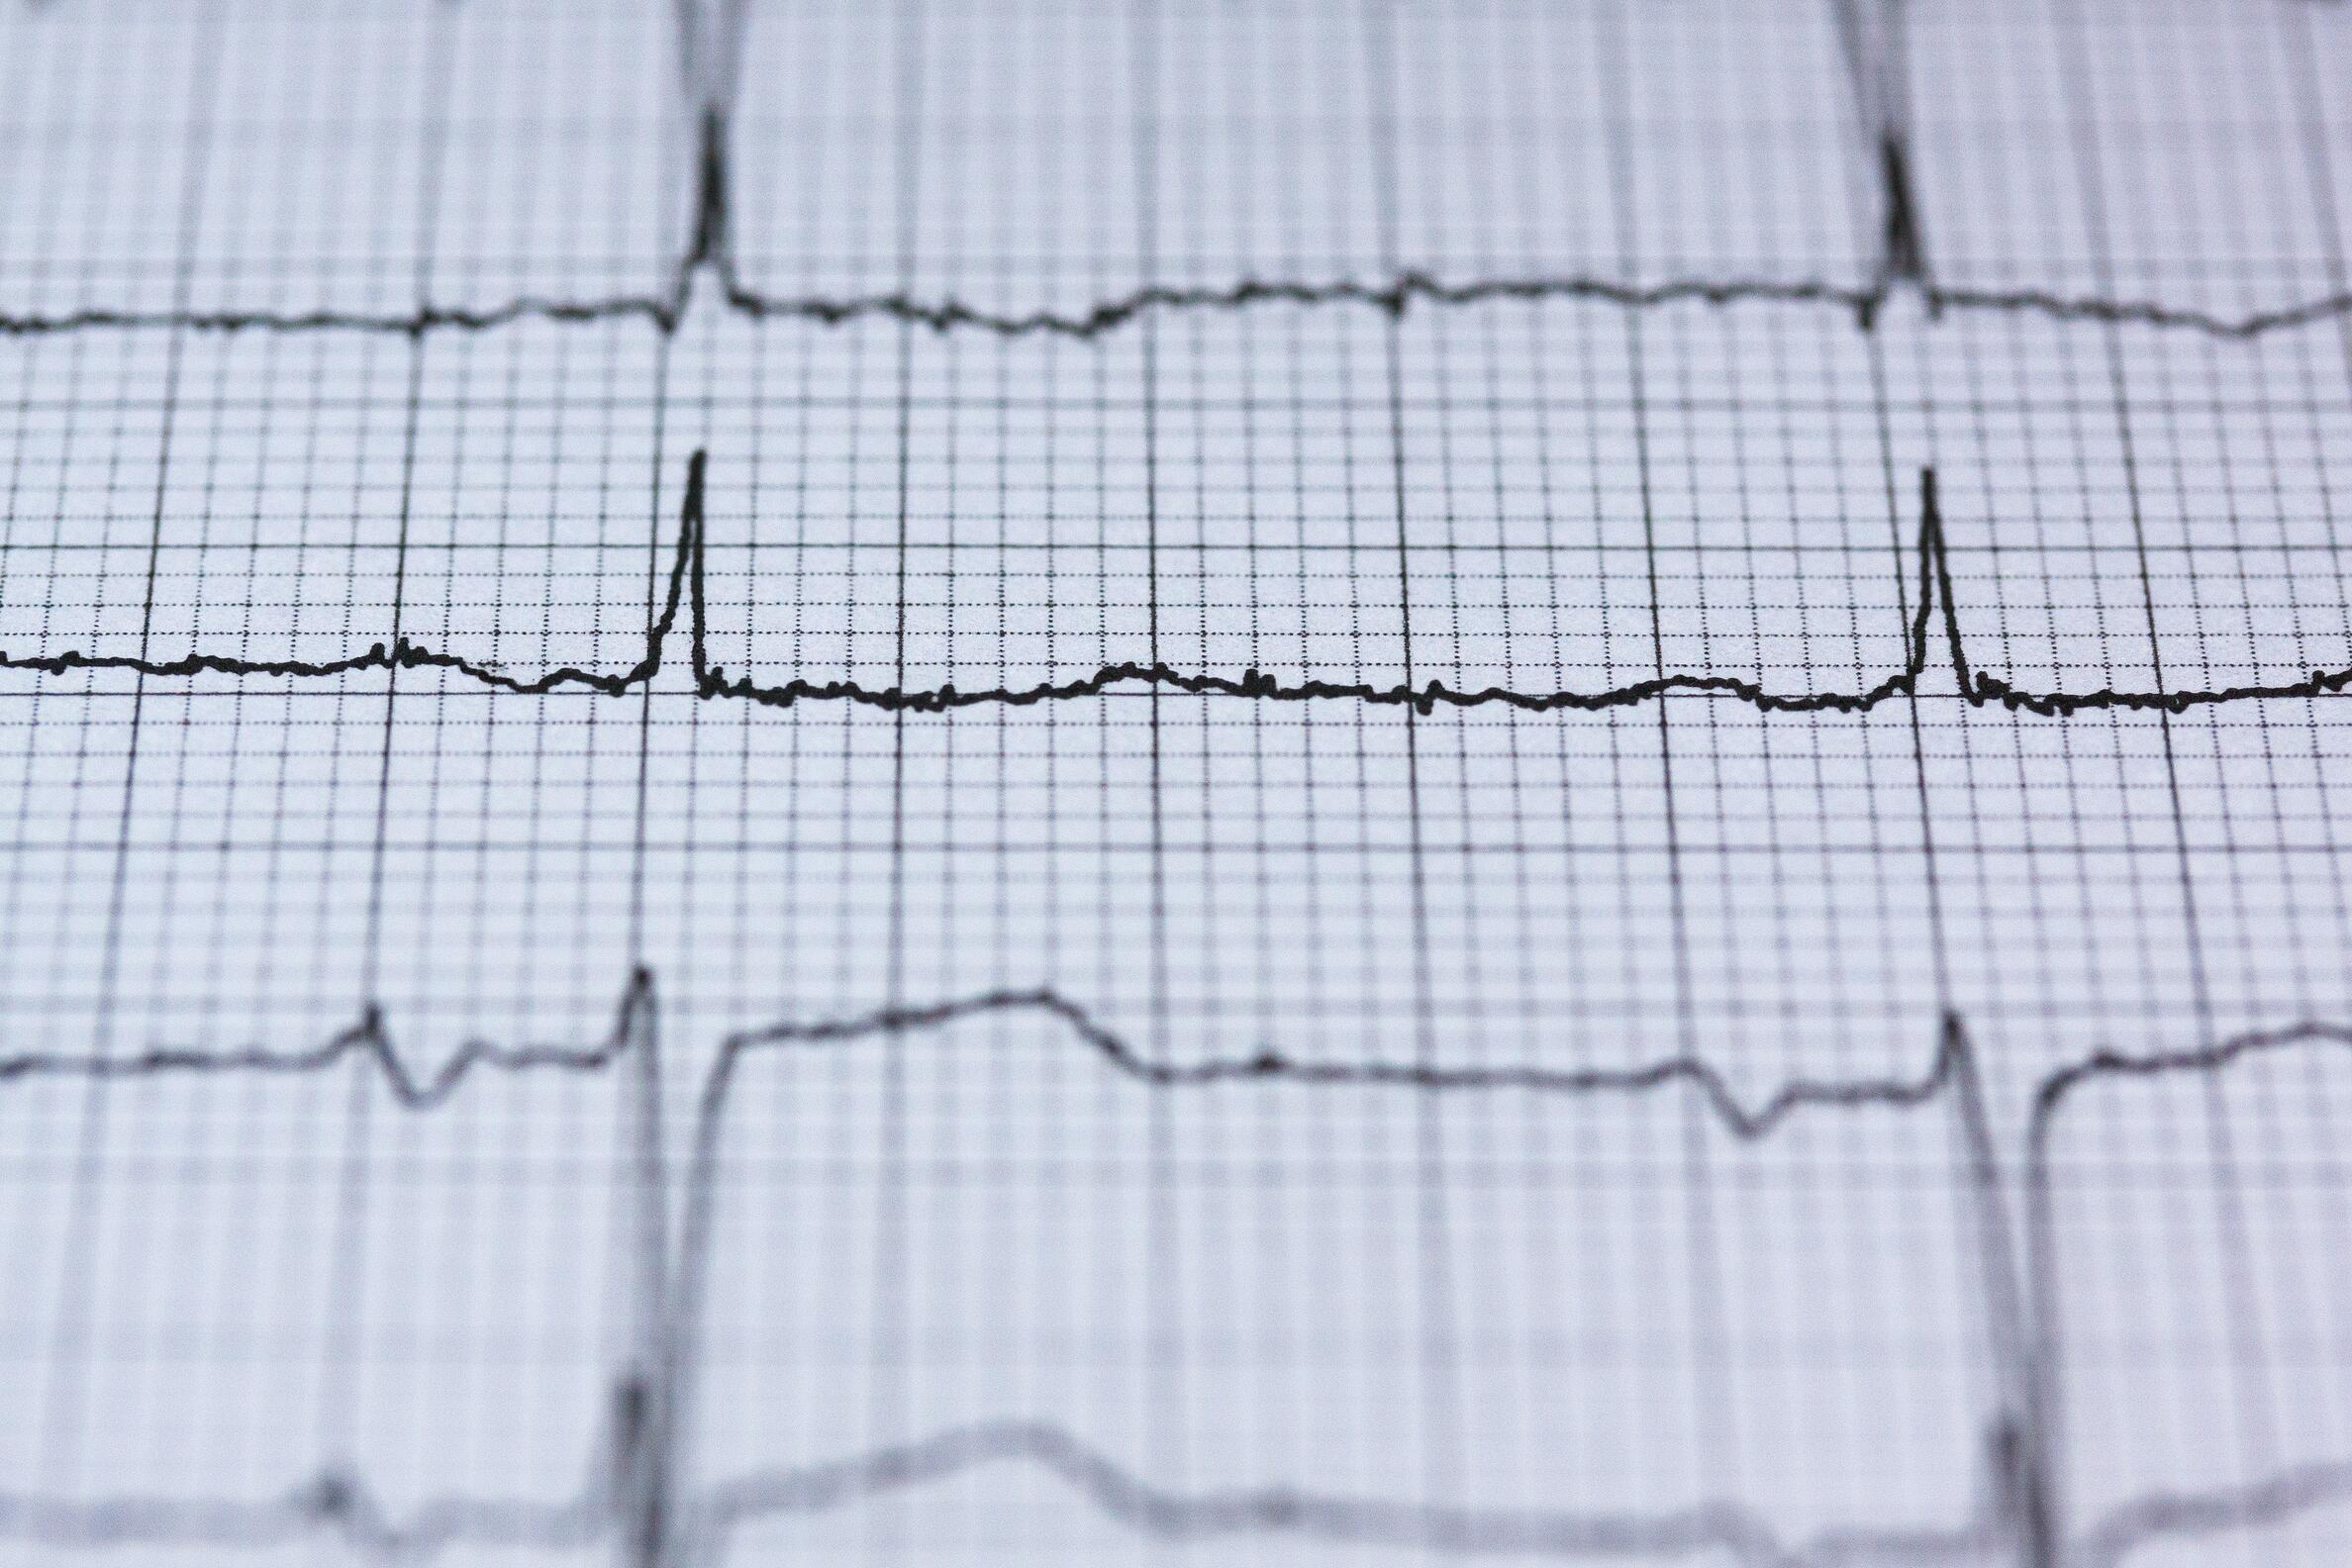 EKG technician job outlook & opportunities